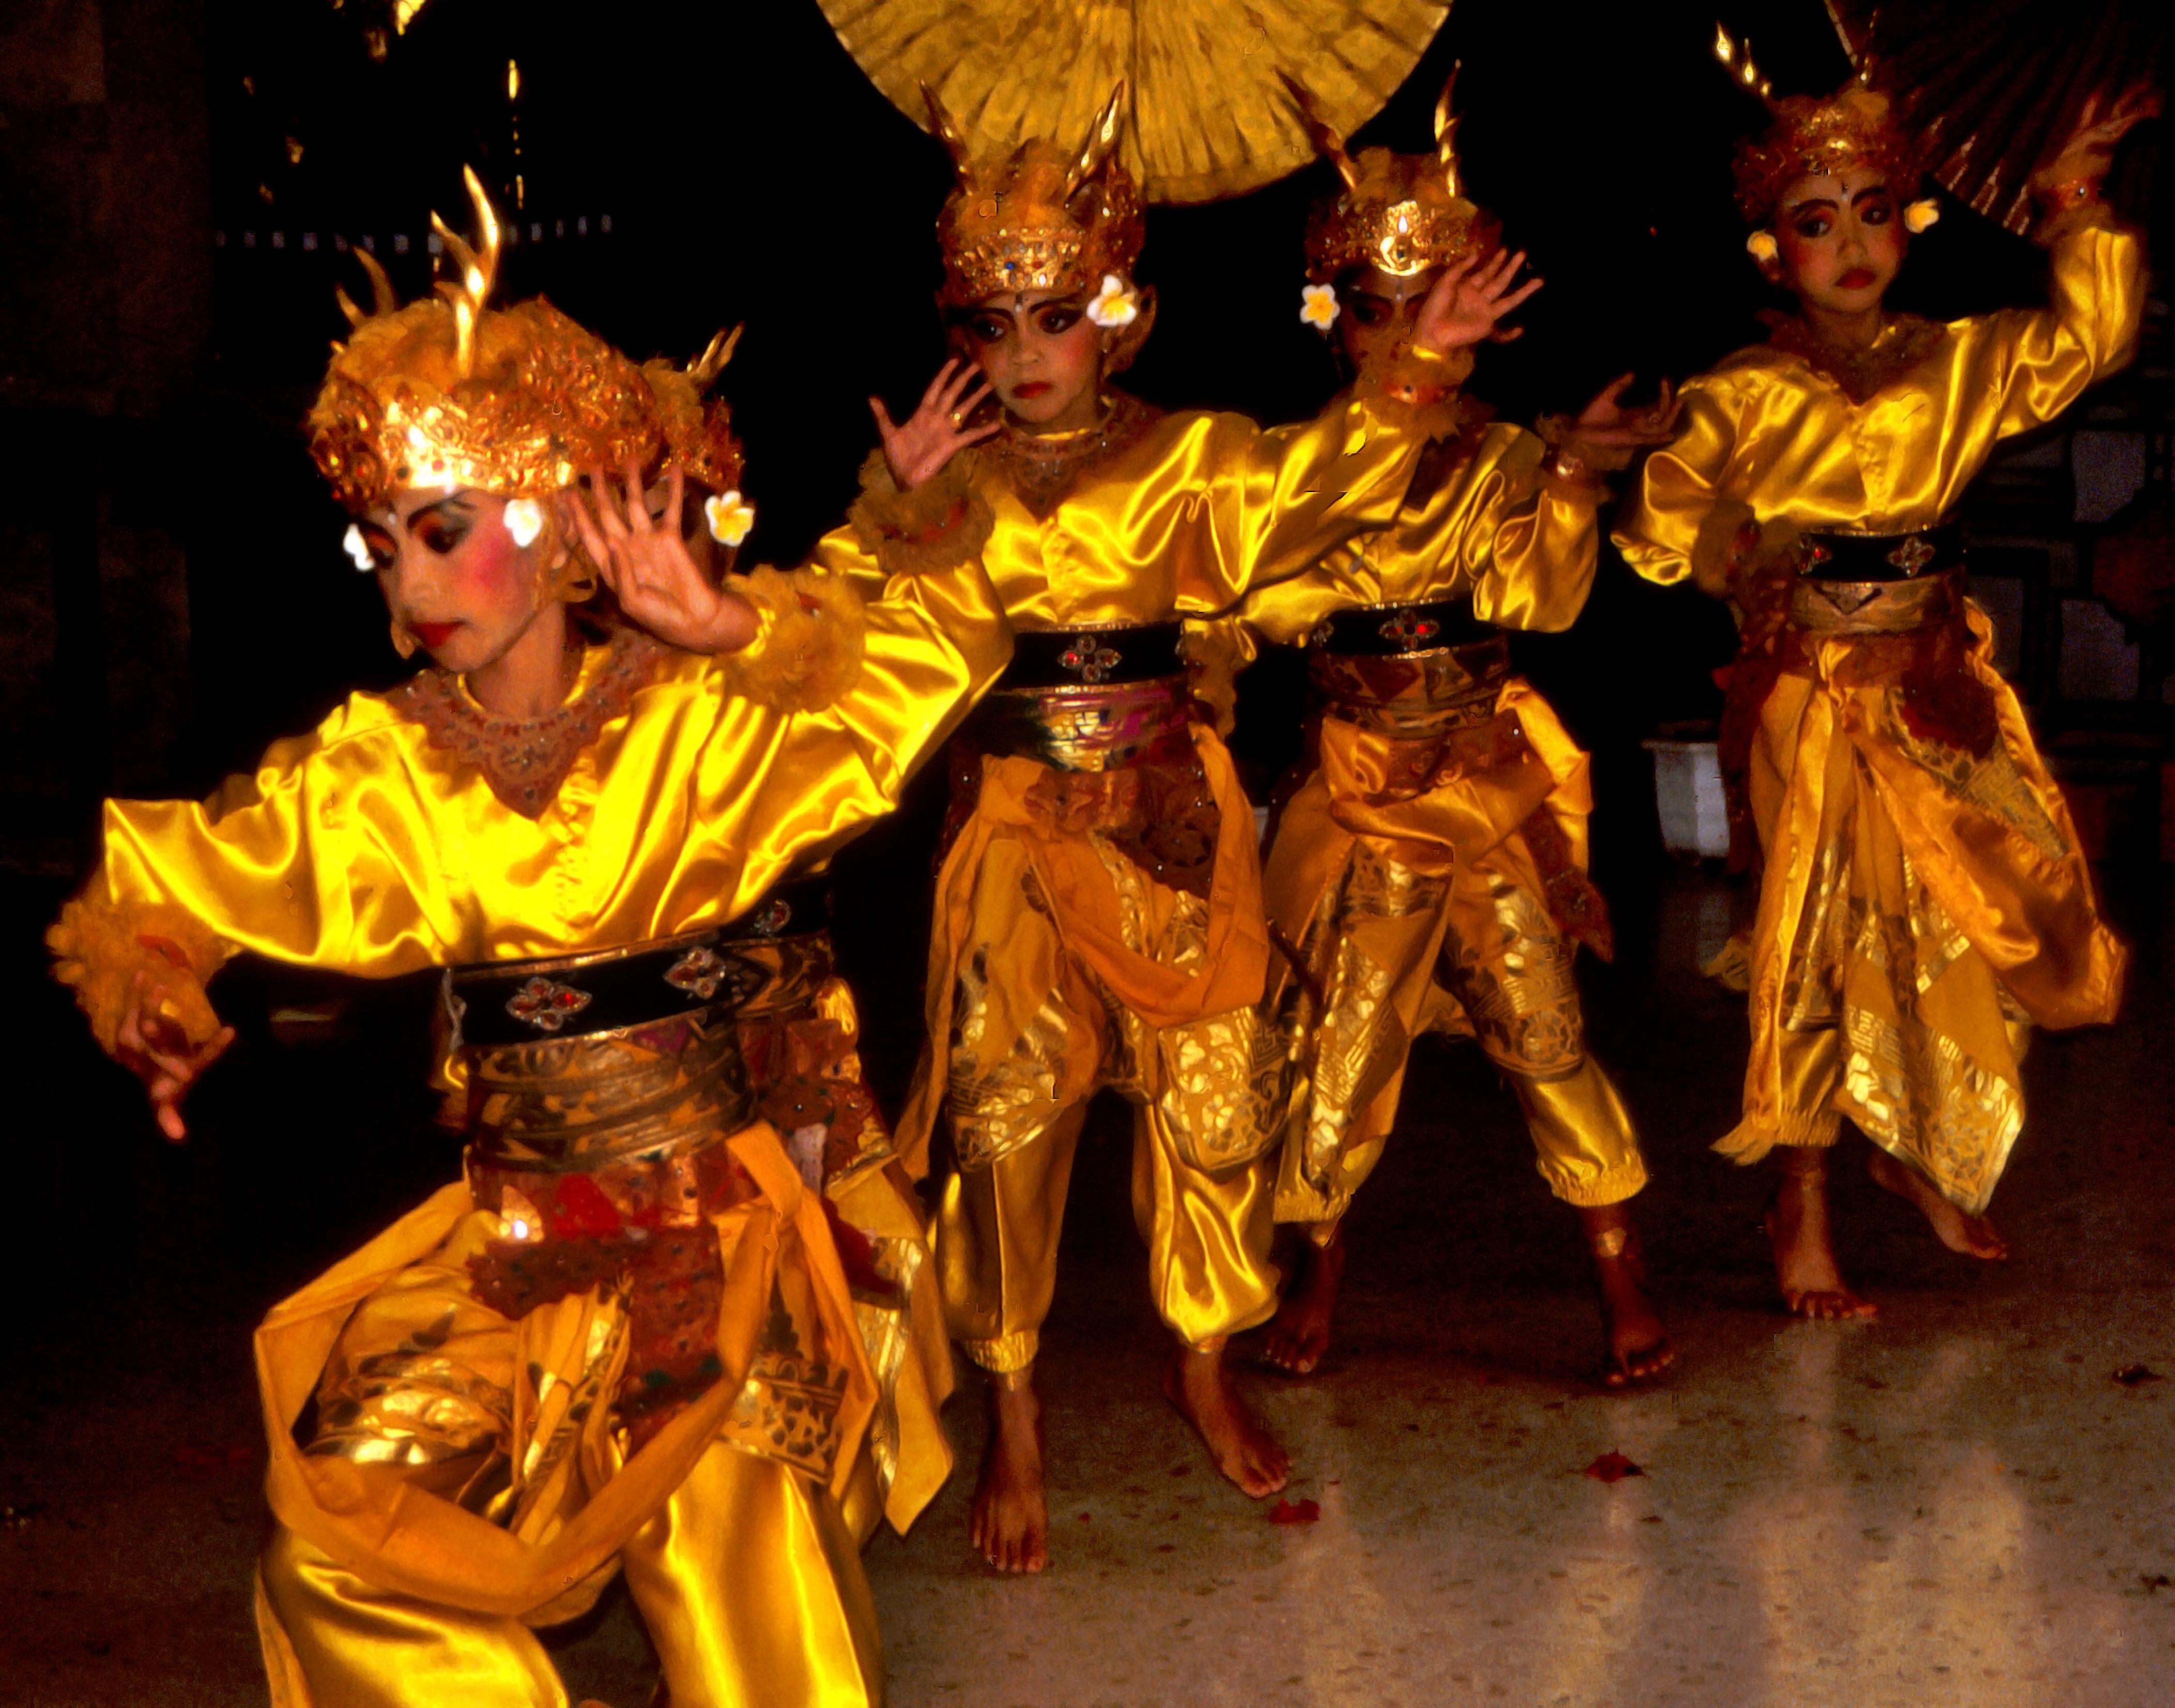 File:Bali Dancers Balinese Dance - Yellow Gold Silk.jpg ...